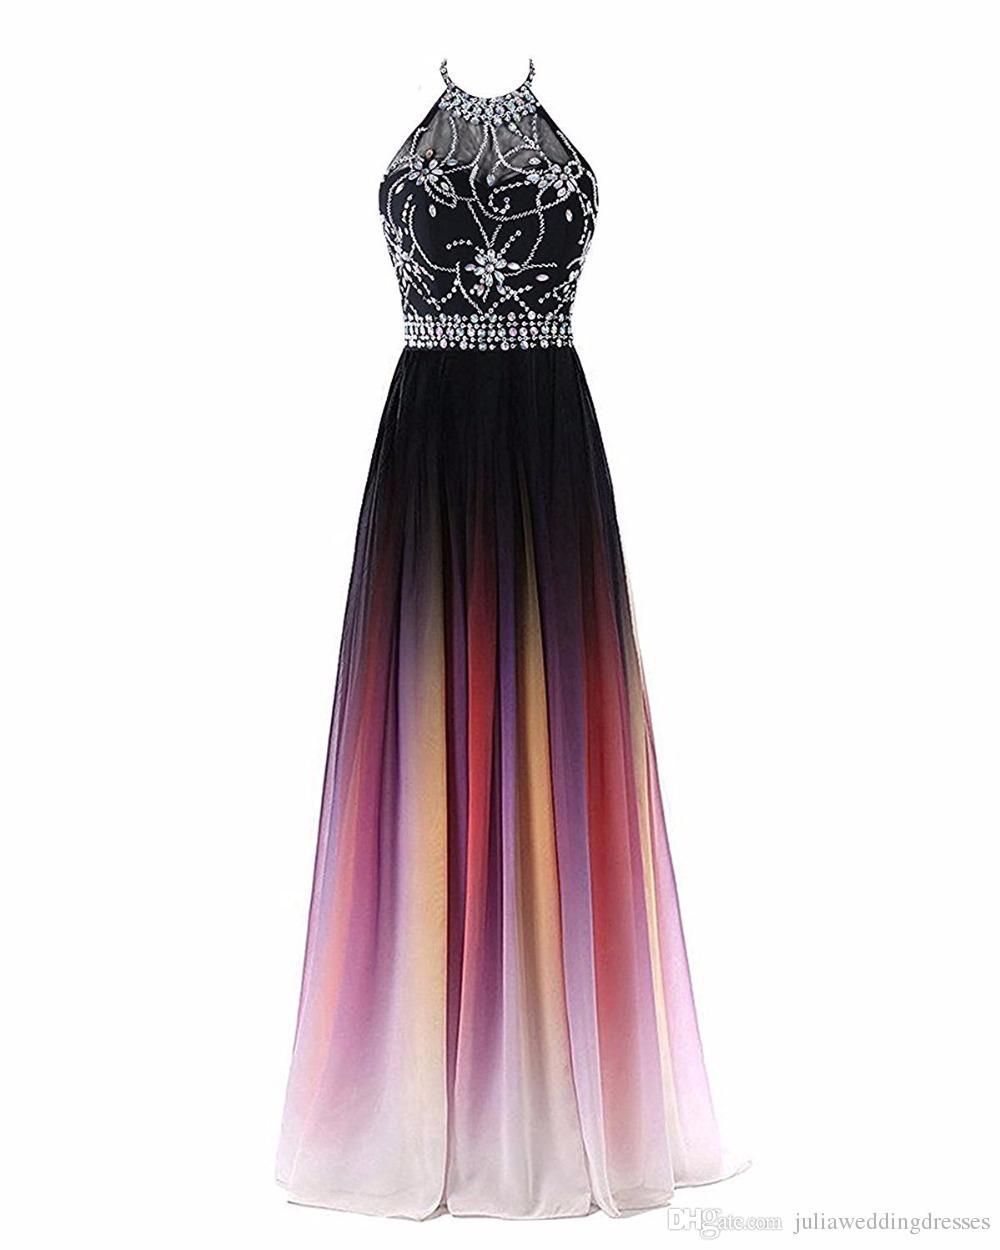 2018 Mais Novo Venda Quente Sexy Halter Gradiente Vestidos de Baile Com Longo Chiffon Plus Size Ombre Evening Partido Vestidos Formais vestido de Festa